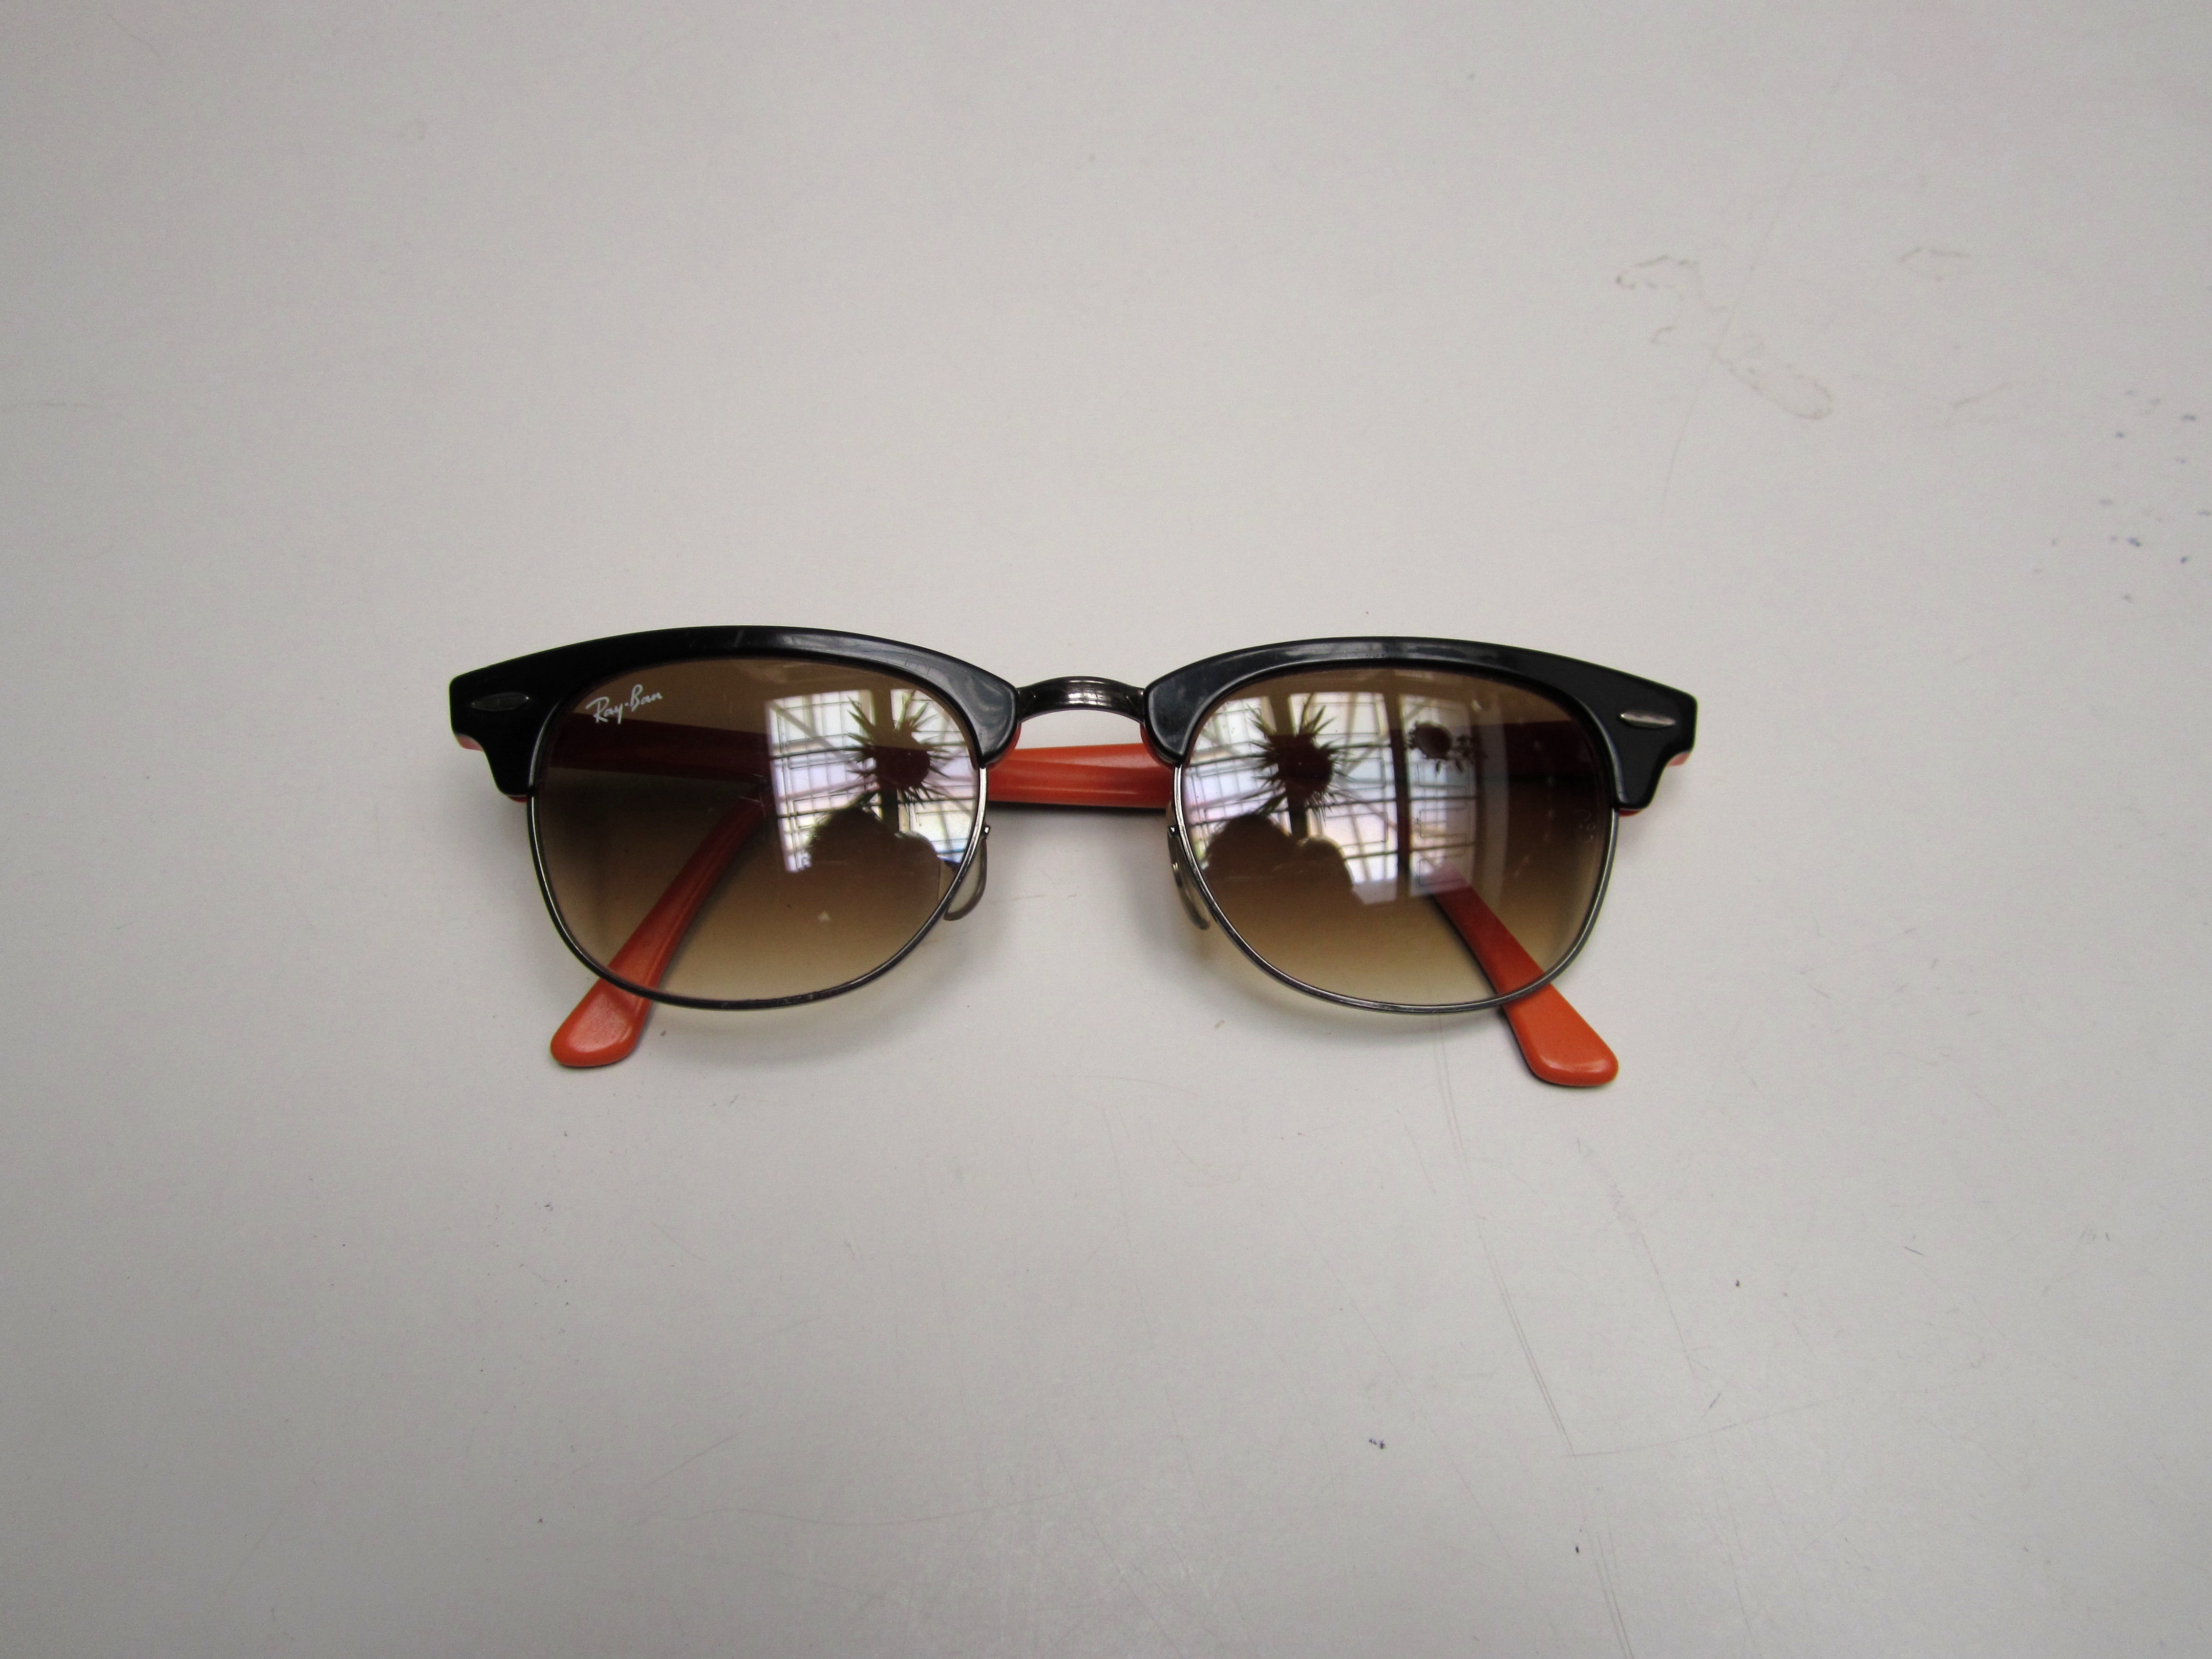 ray ban sunglasses 2015 zvtn  Fm5aognqgzpdr8y Ray Ban 2015